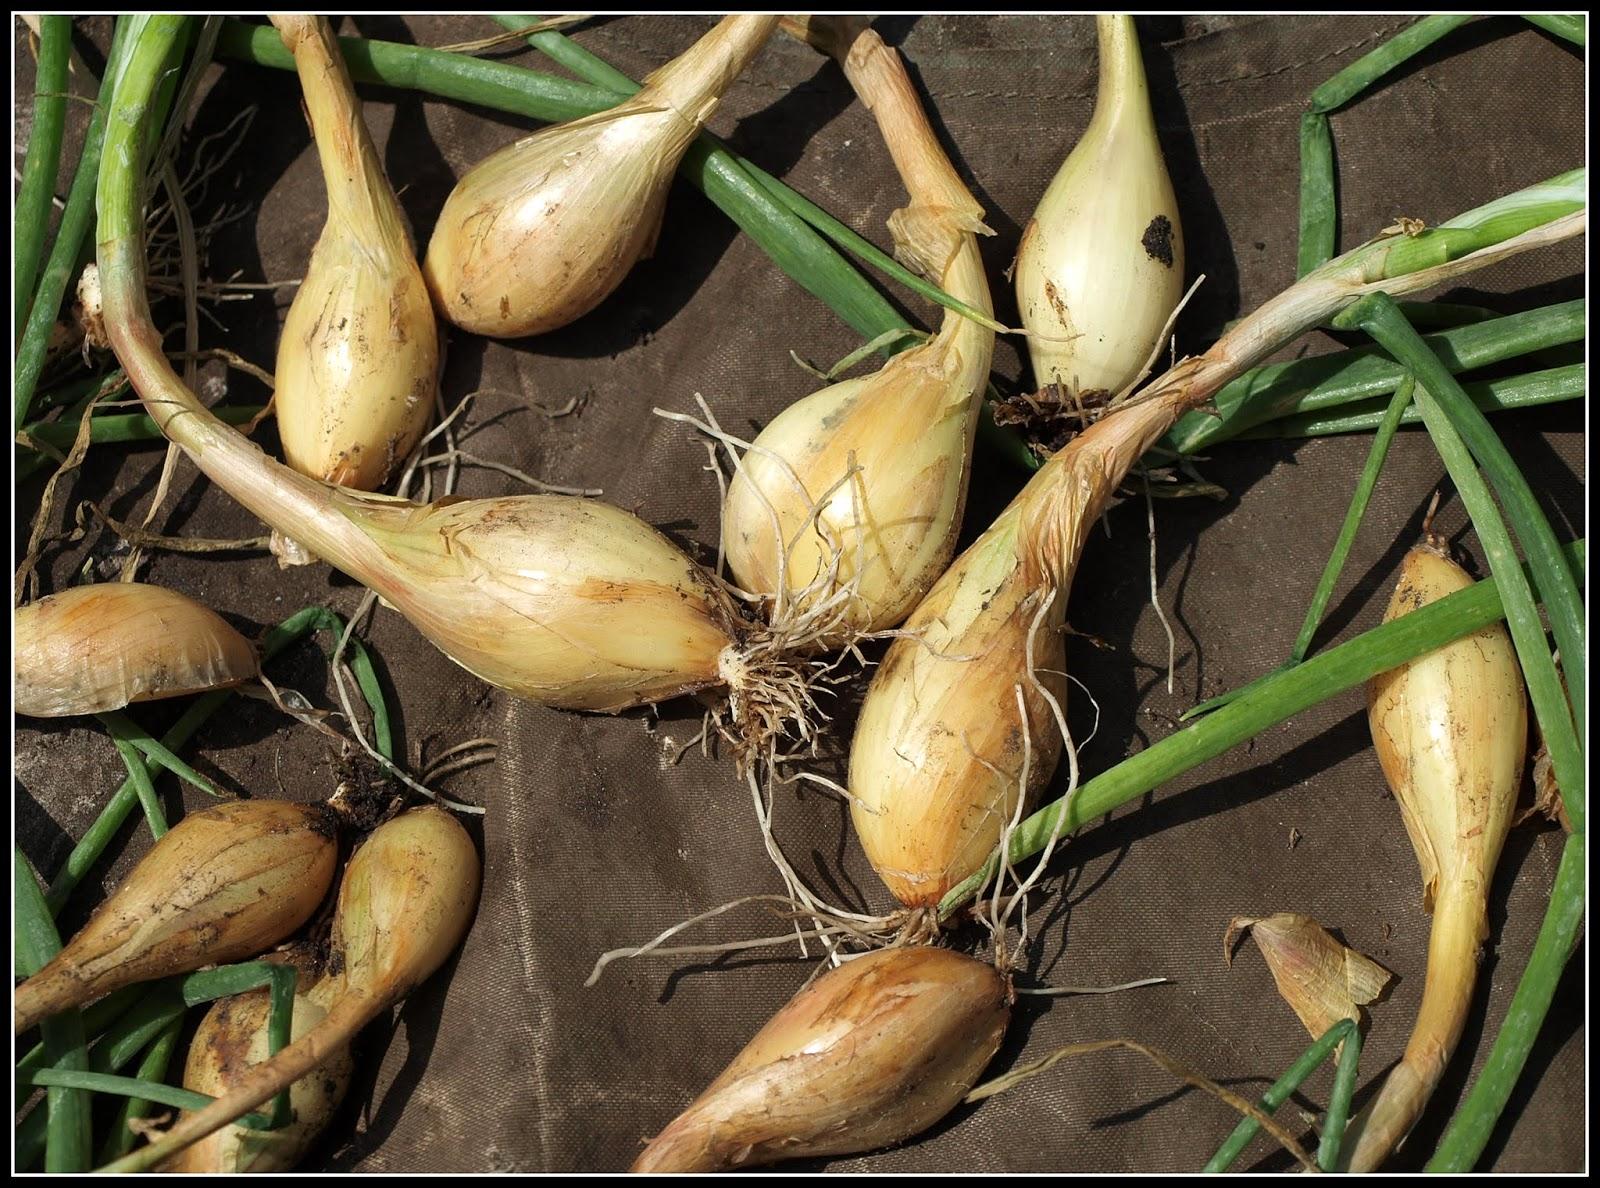 Mark's Veg Plot: Harvesting Shallots